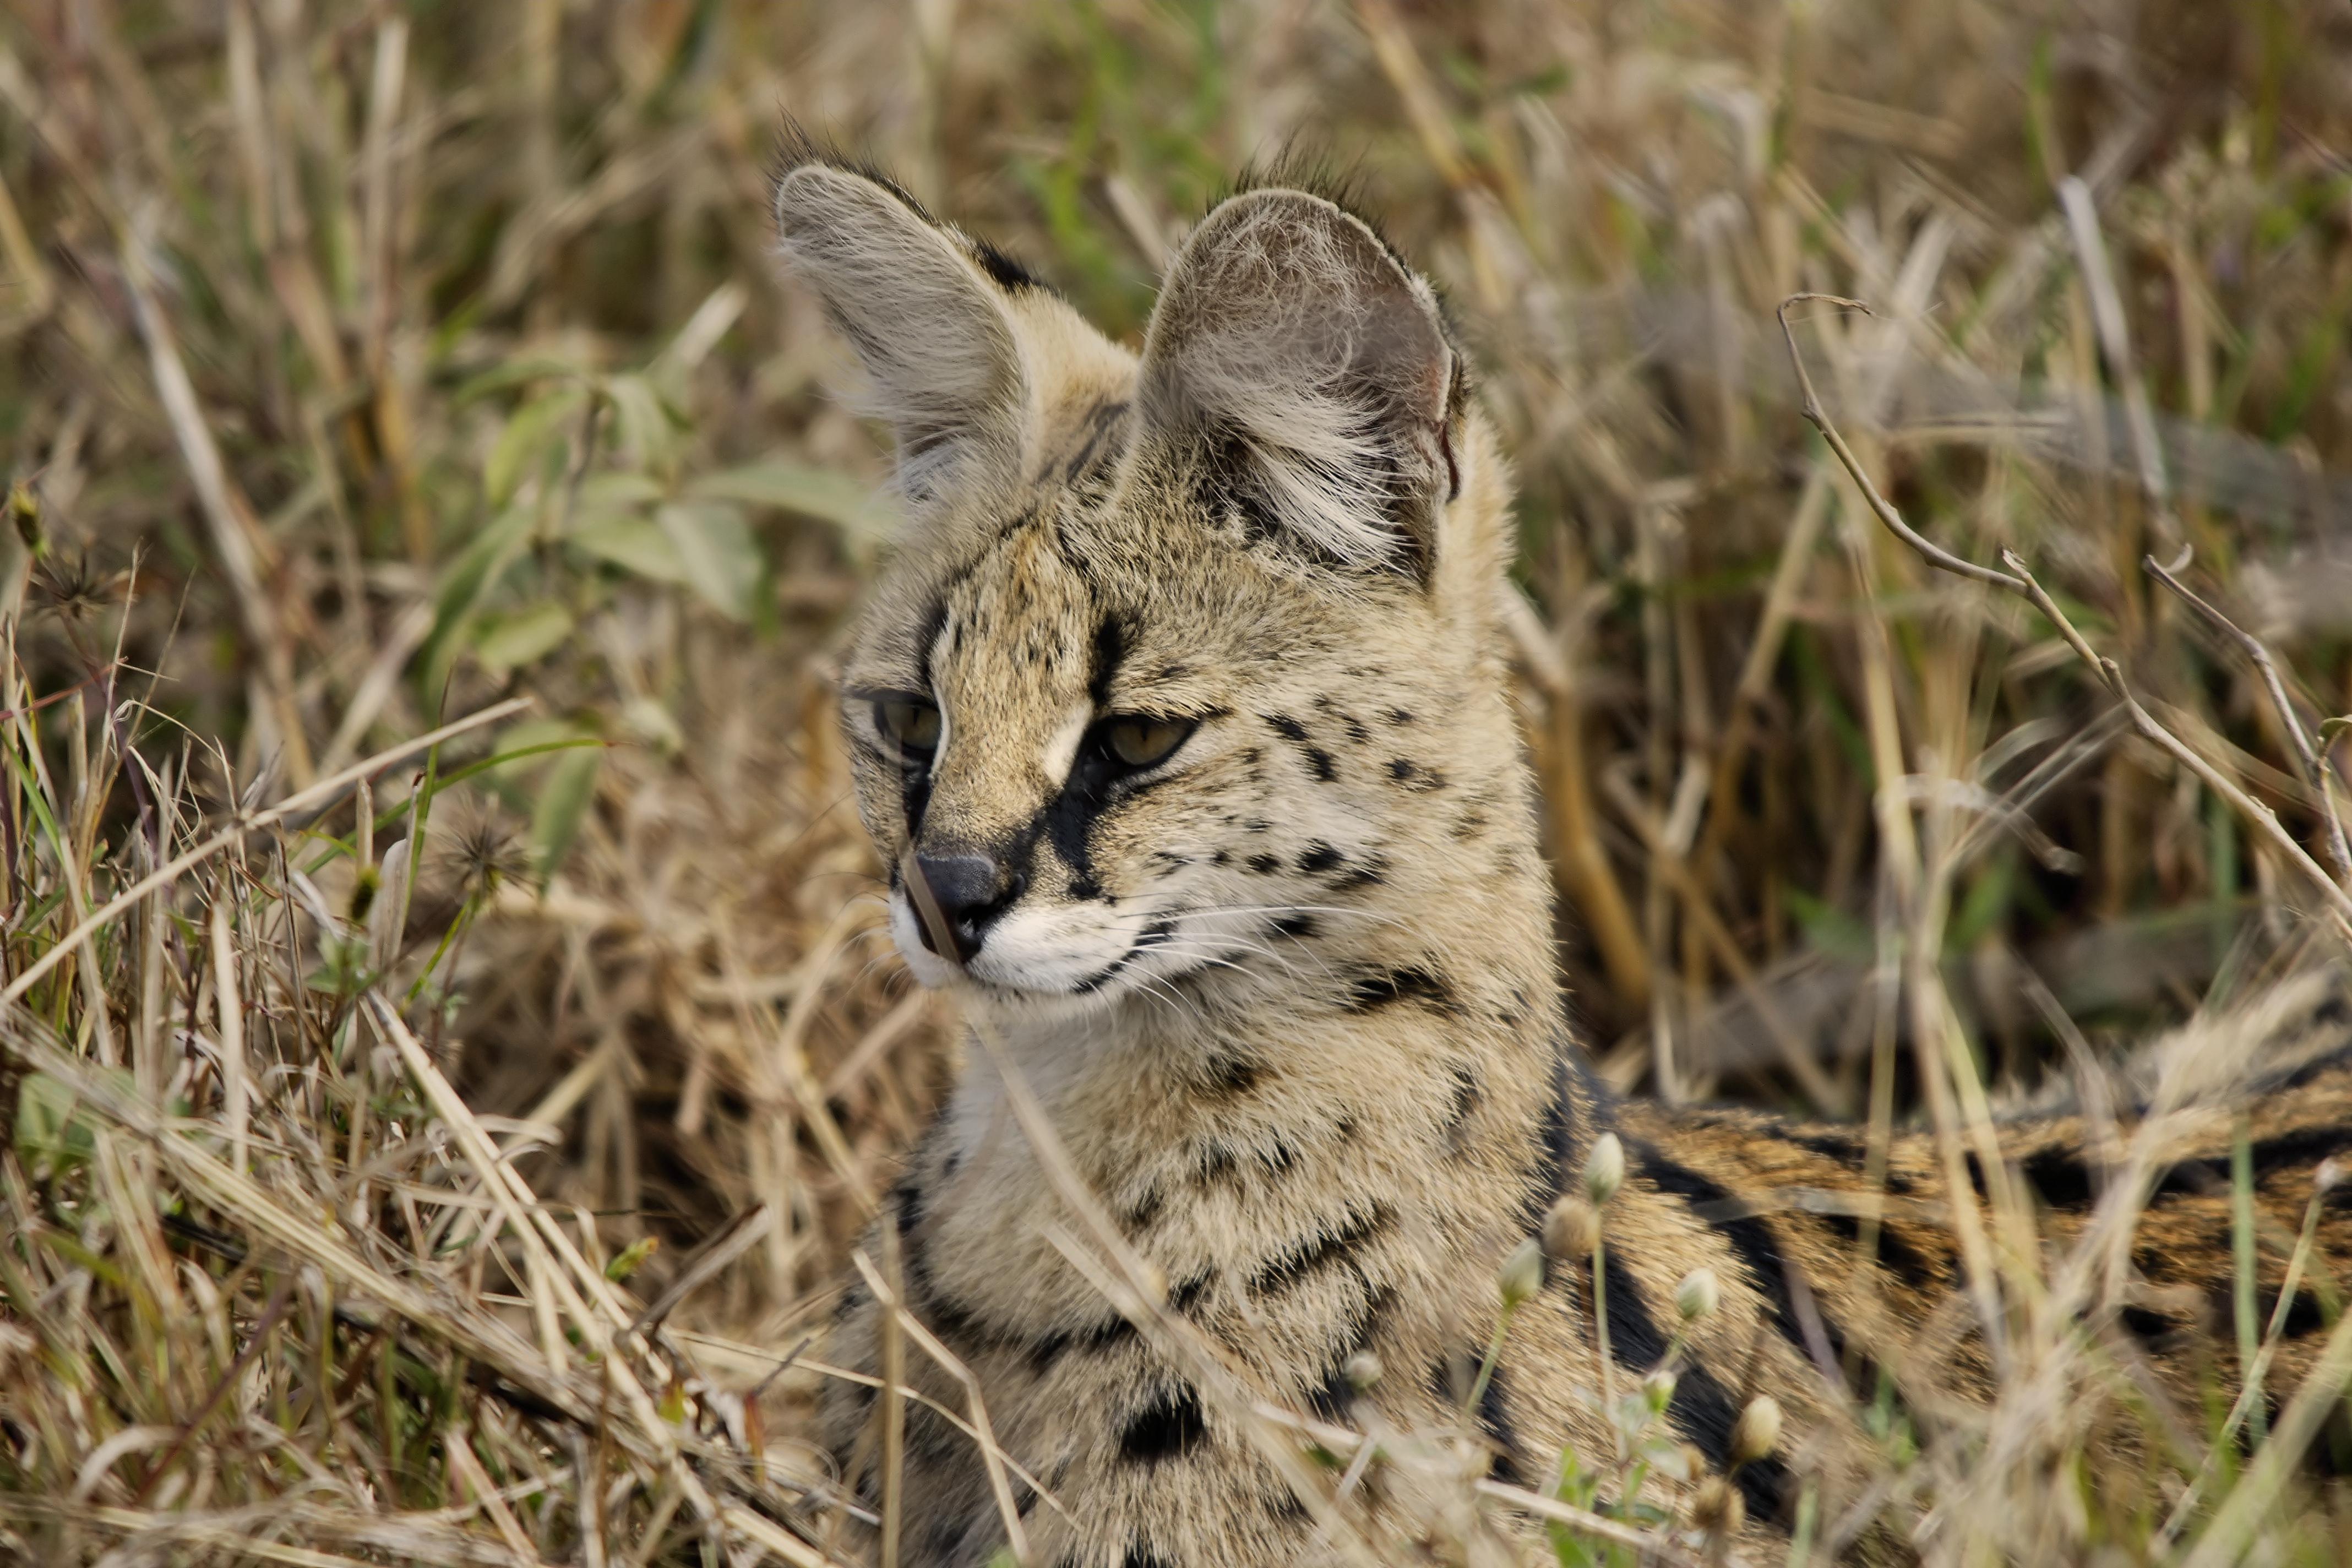 serval-lying-in-grass-on-alert